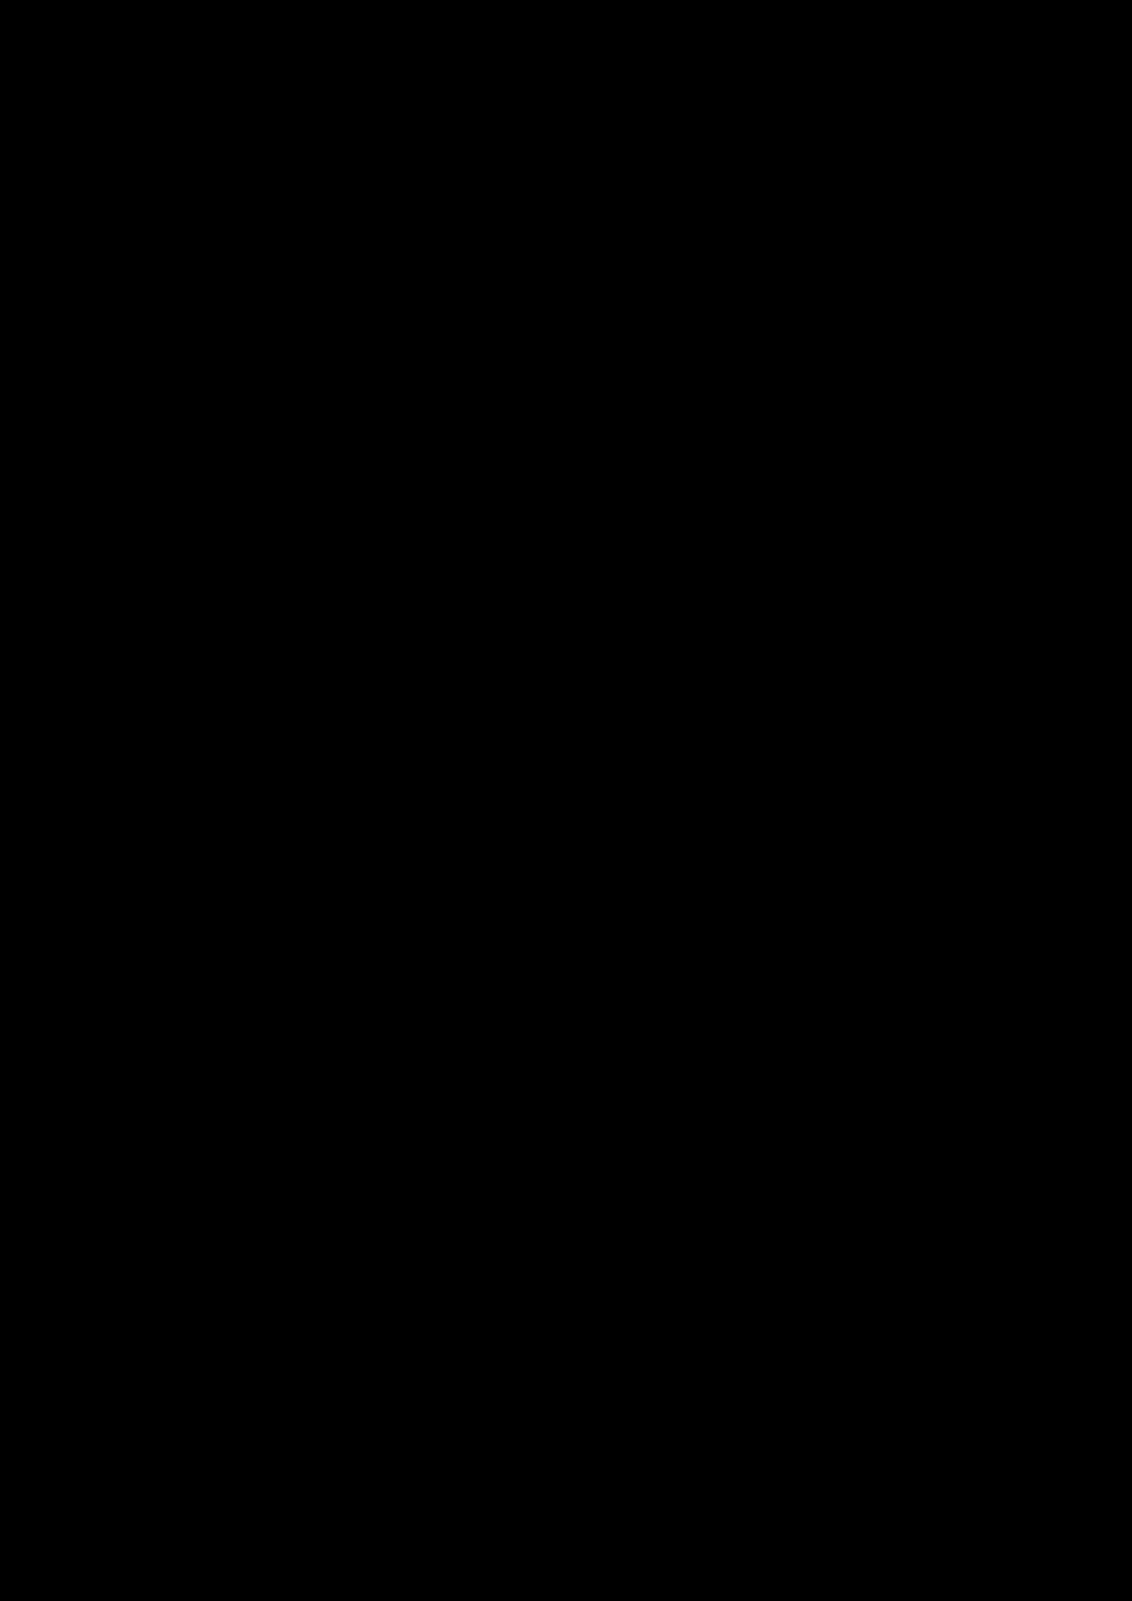 Belyiy sokol slide, Image 192